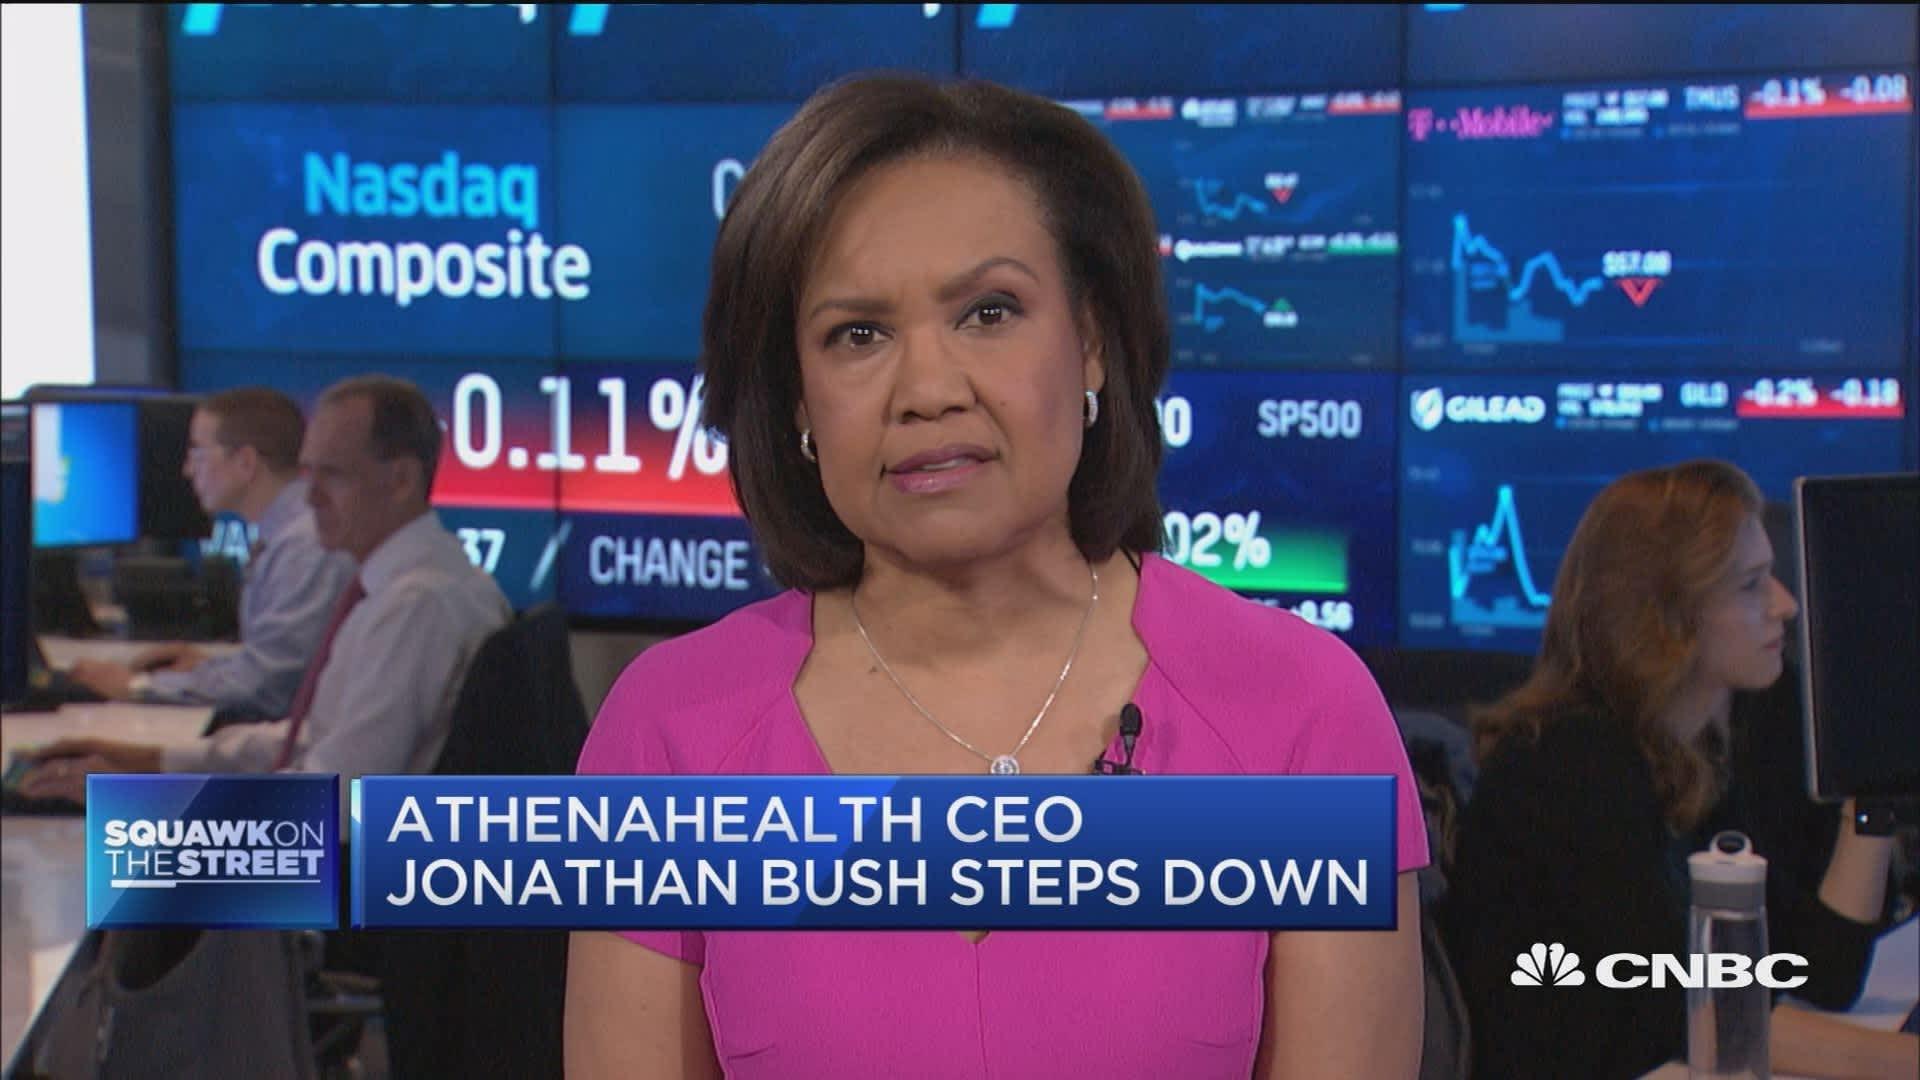 Jonathan Bush Goodbye Memo To Athenahealth Employees